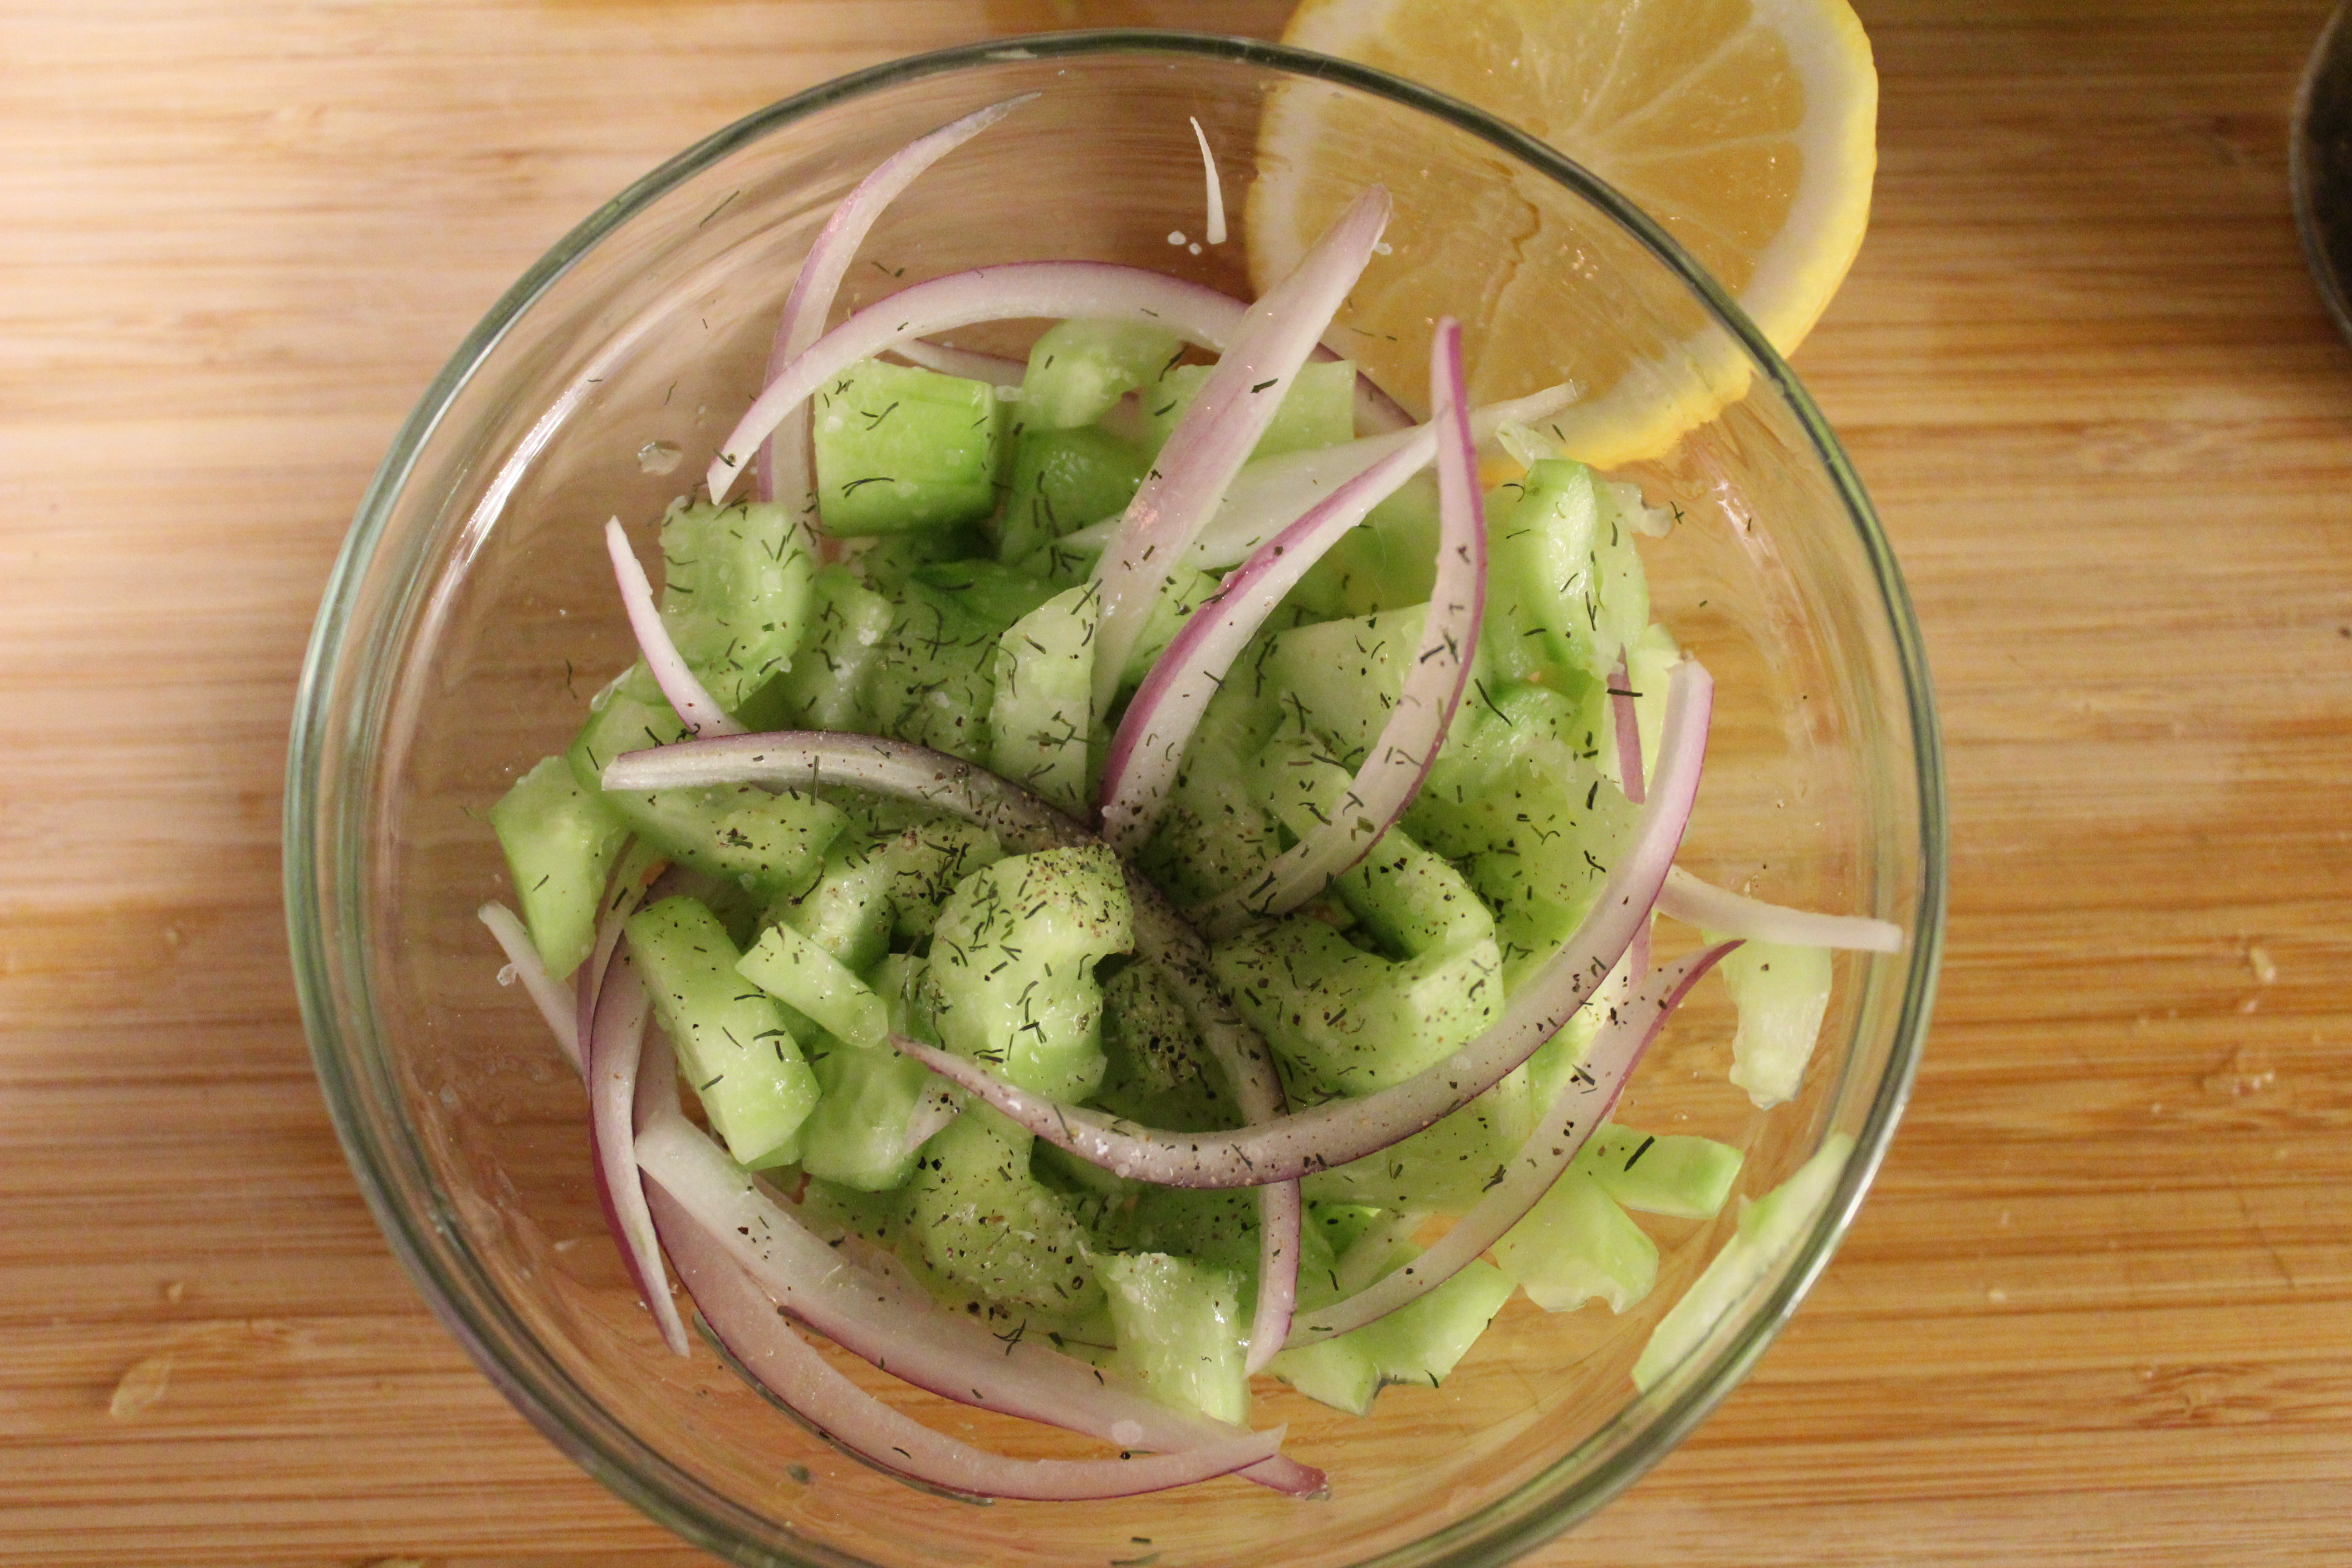 Finished Cucumber Salad - Morrocan Bowls